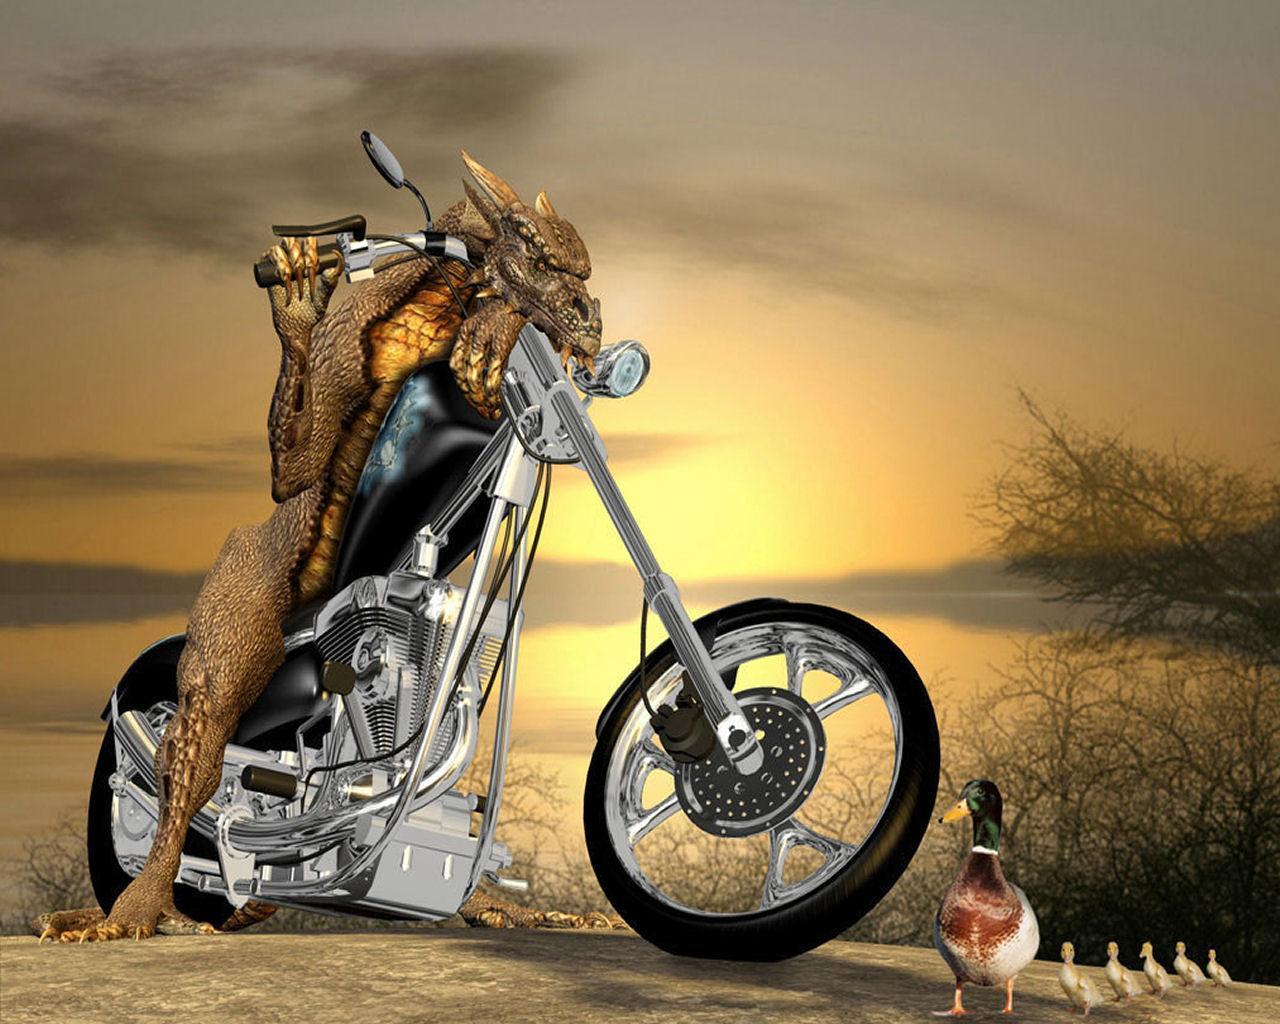 http://4.bp.blogspot.com/-Ft4GWmbQIGg/T7RP64KIw5I/AAAAAAAAB8s/6ZYHZ-A0MmE/s1600/funny-wallpaper-19.jpg